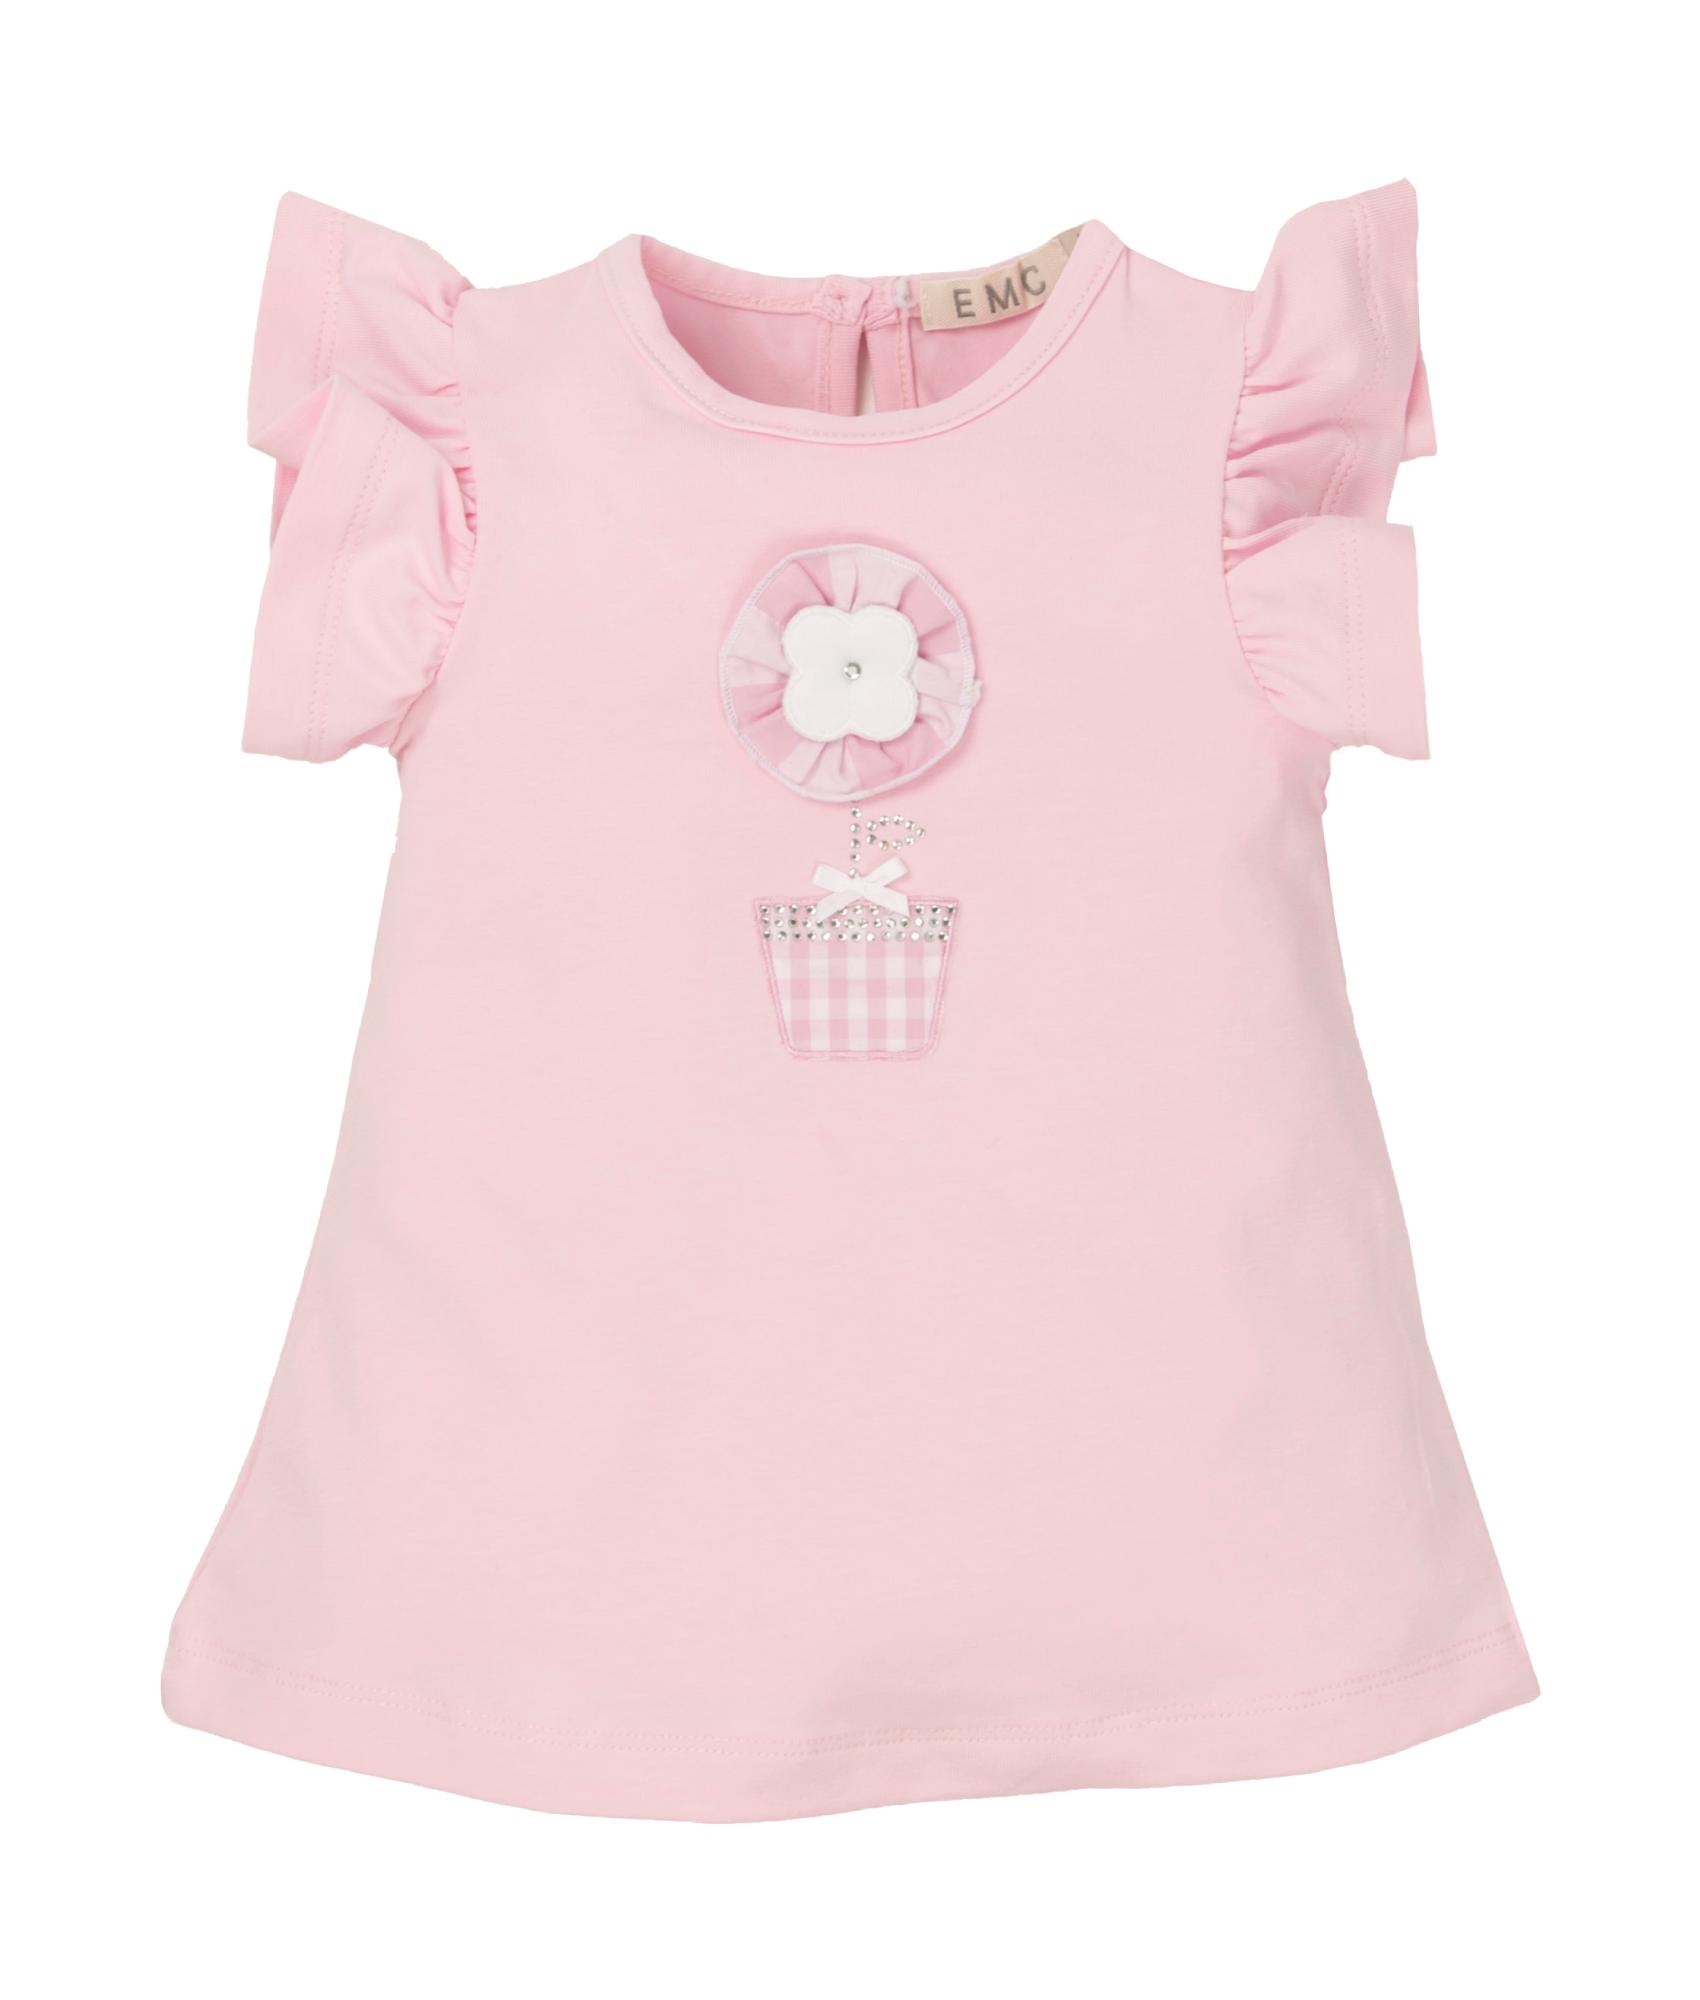 EMC EMC Pink Flower Pot Dress 4587 S21